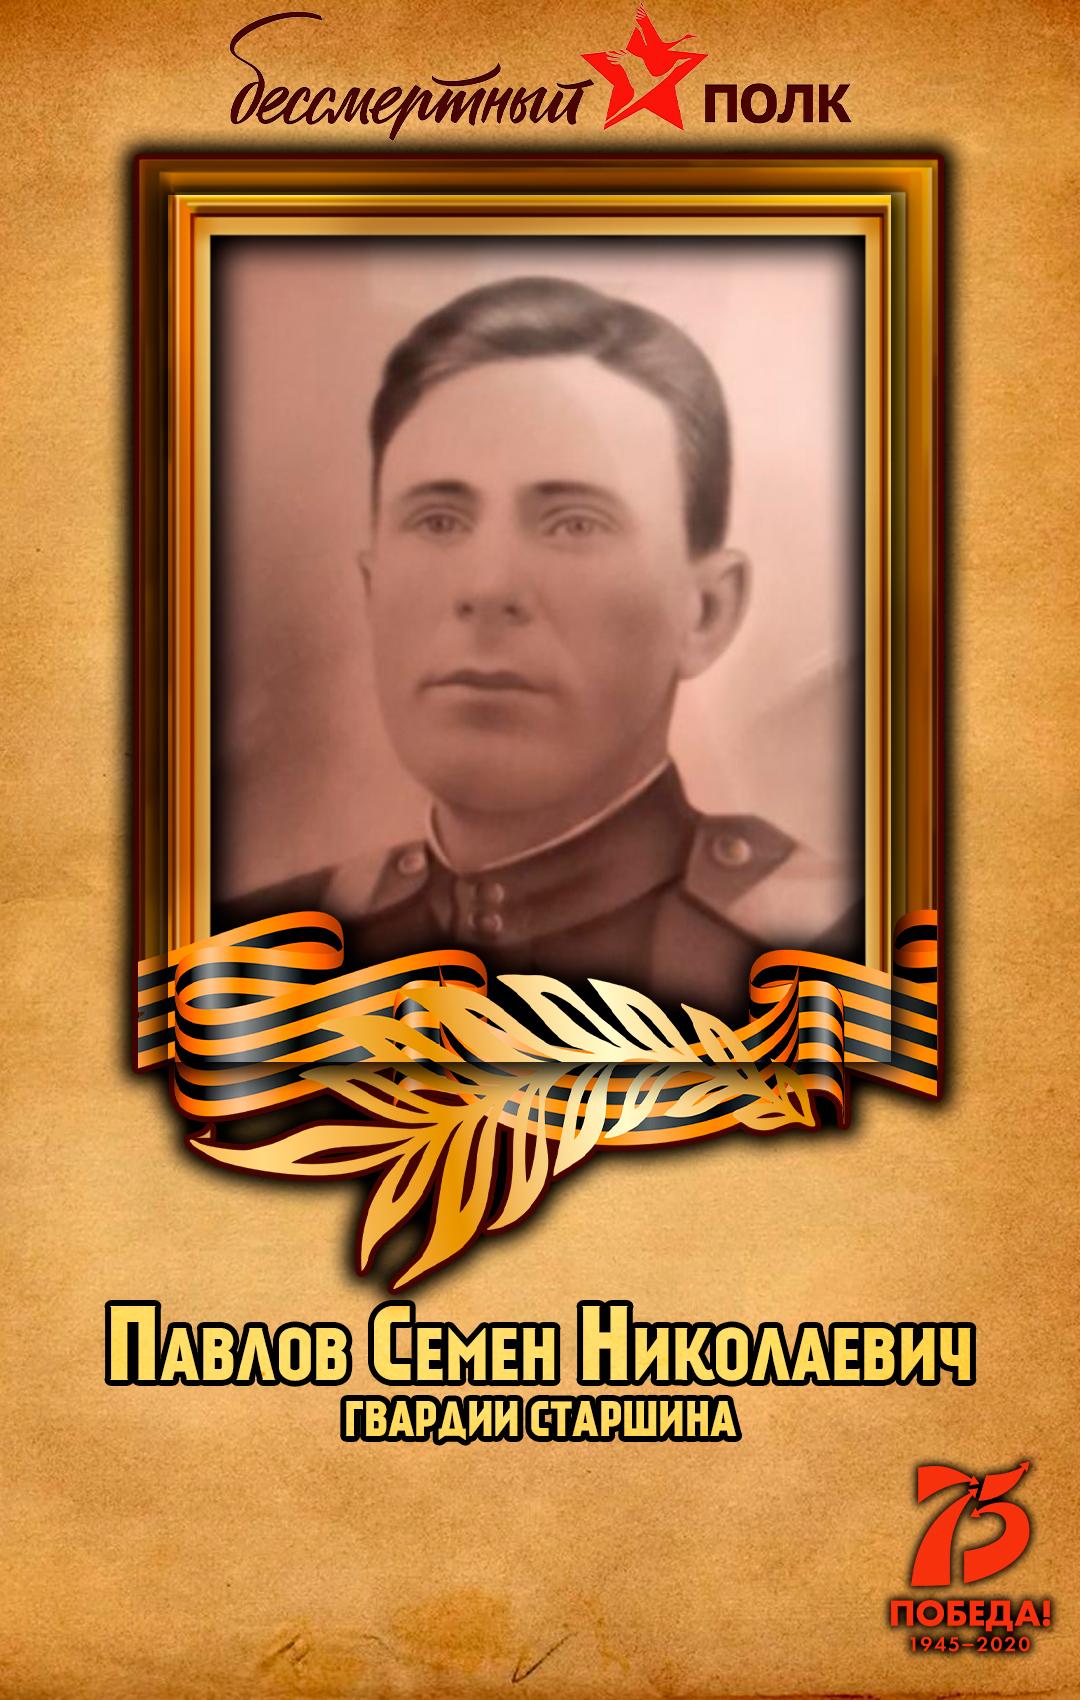 Павлов-Семен-Николаевич